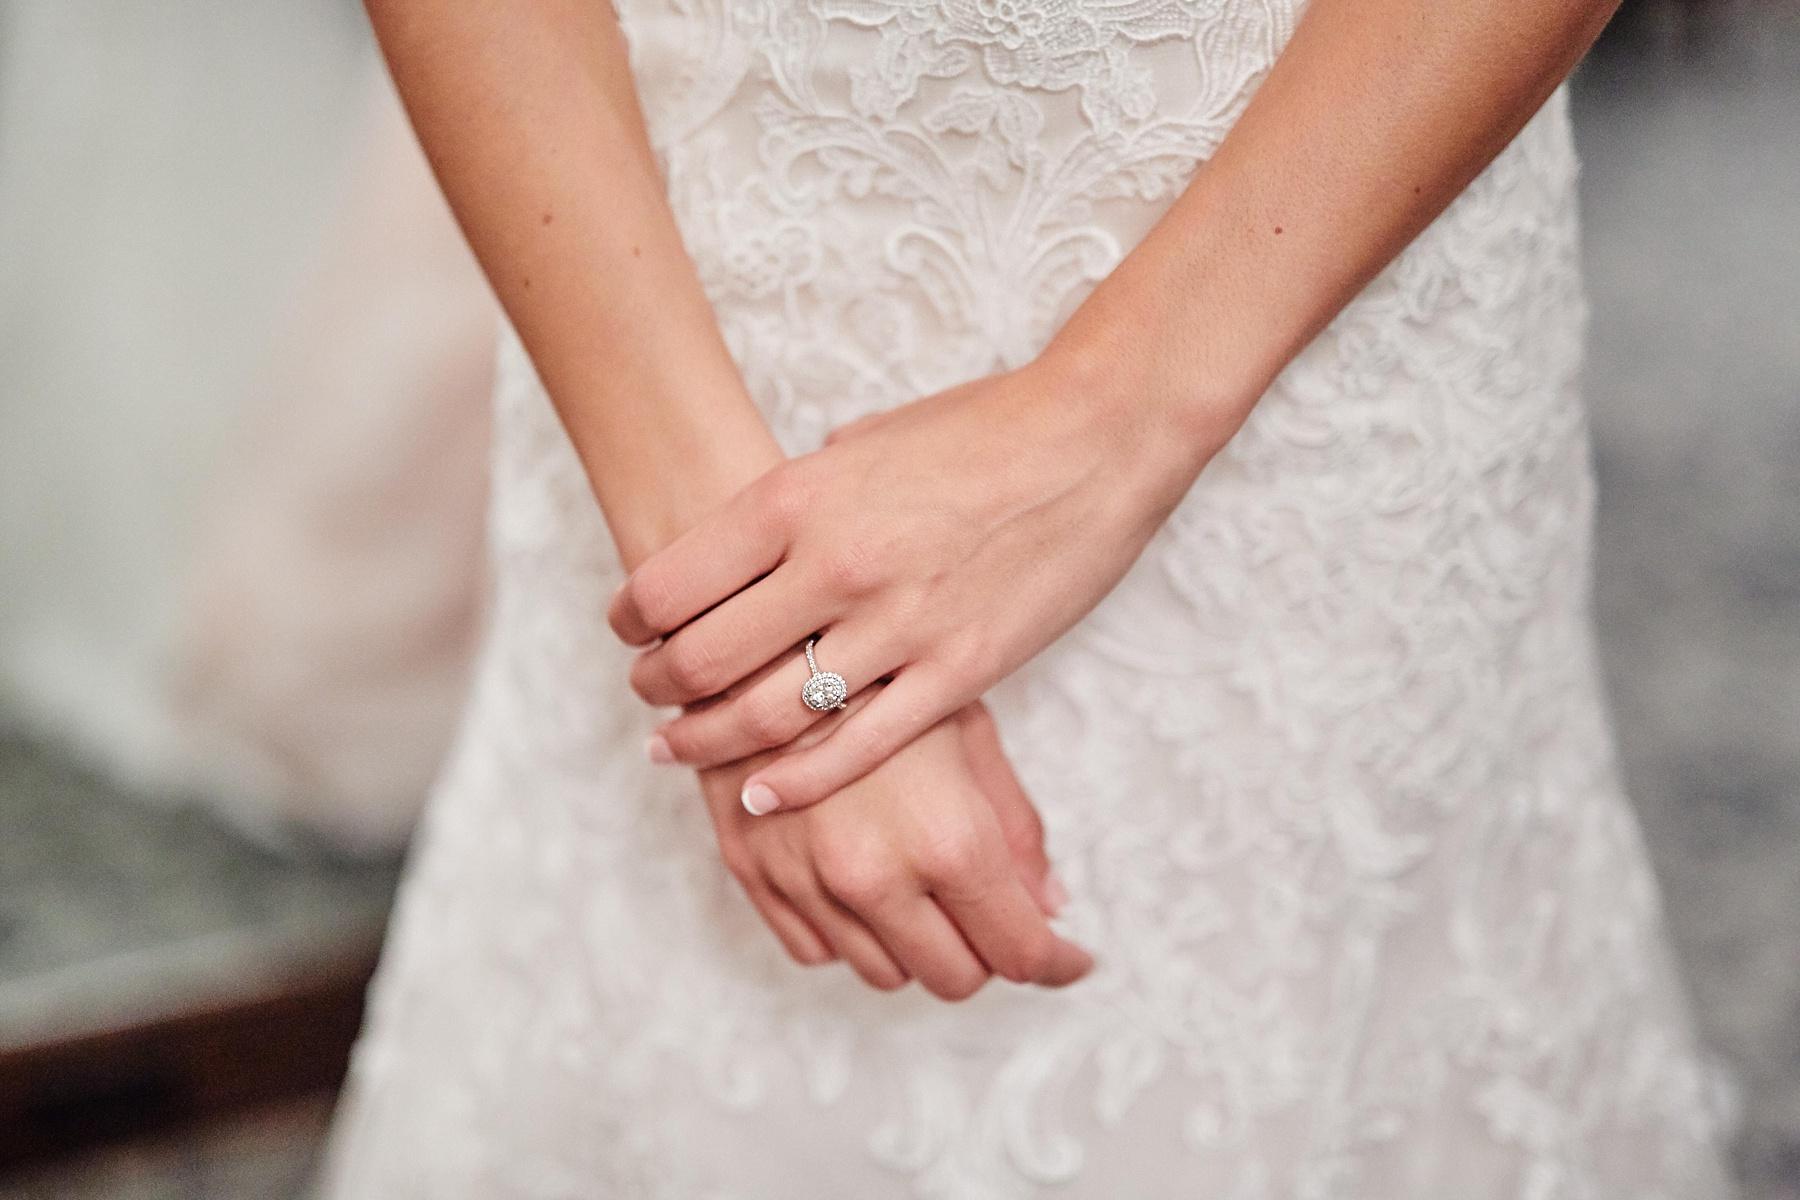 ABULAE-Wedding-Saint-paul-MN-Josh-Sofia-Wedding-Mears-Park_0881.jpg